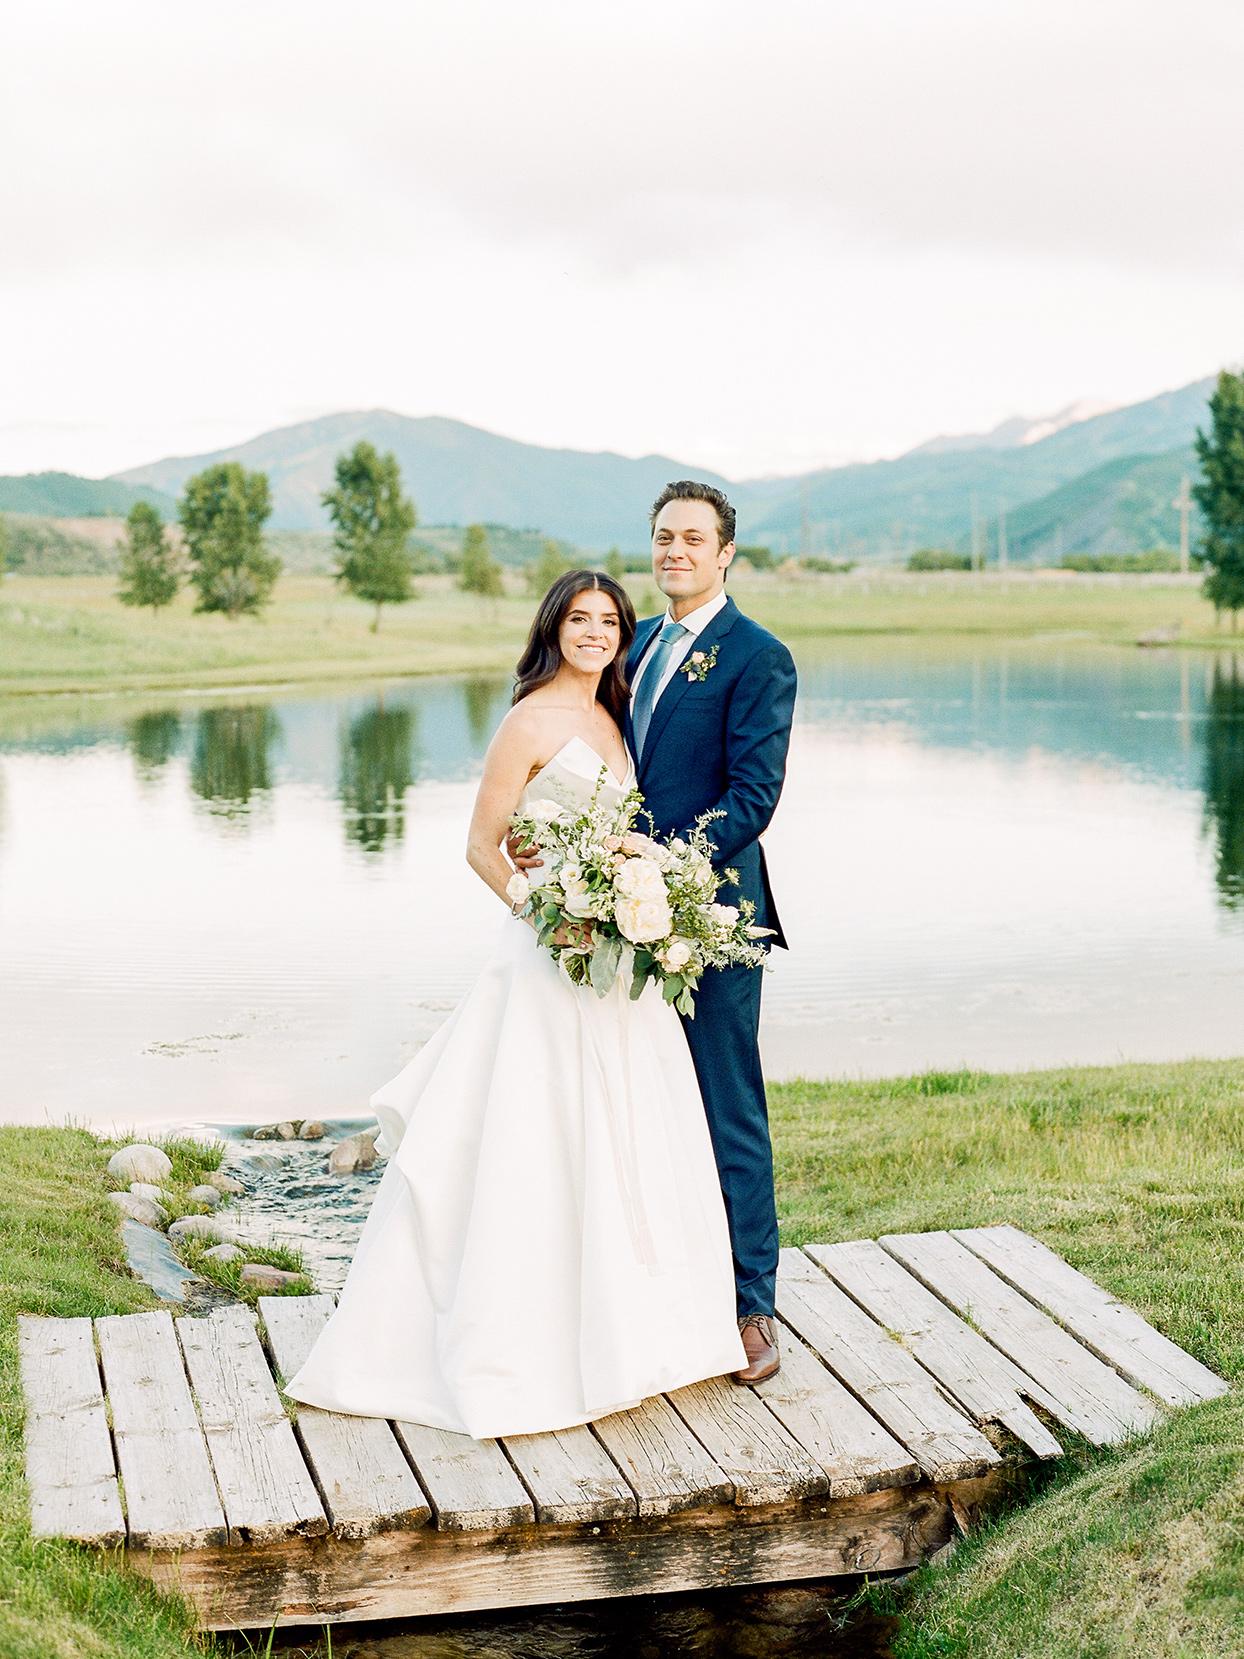 jessica aaron wedding couple on wooden bridge by brook